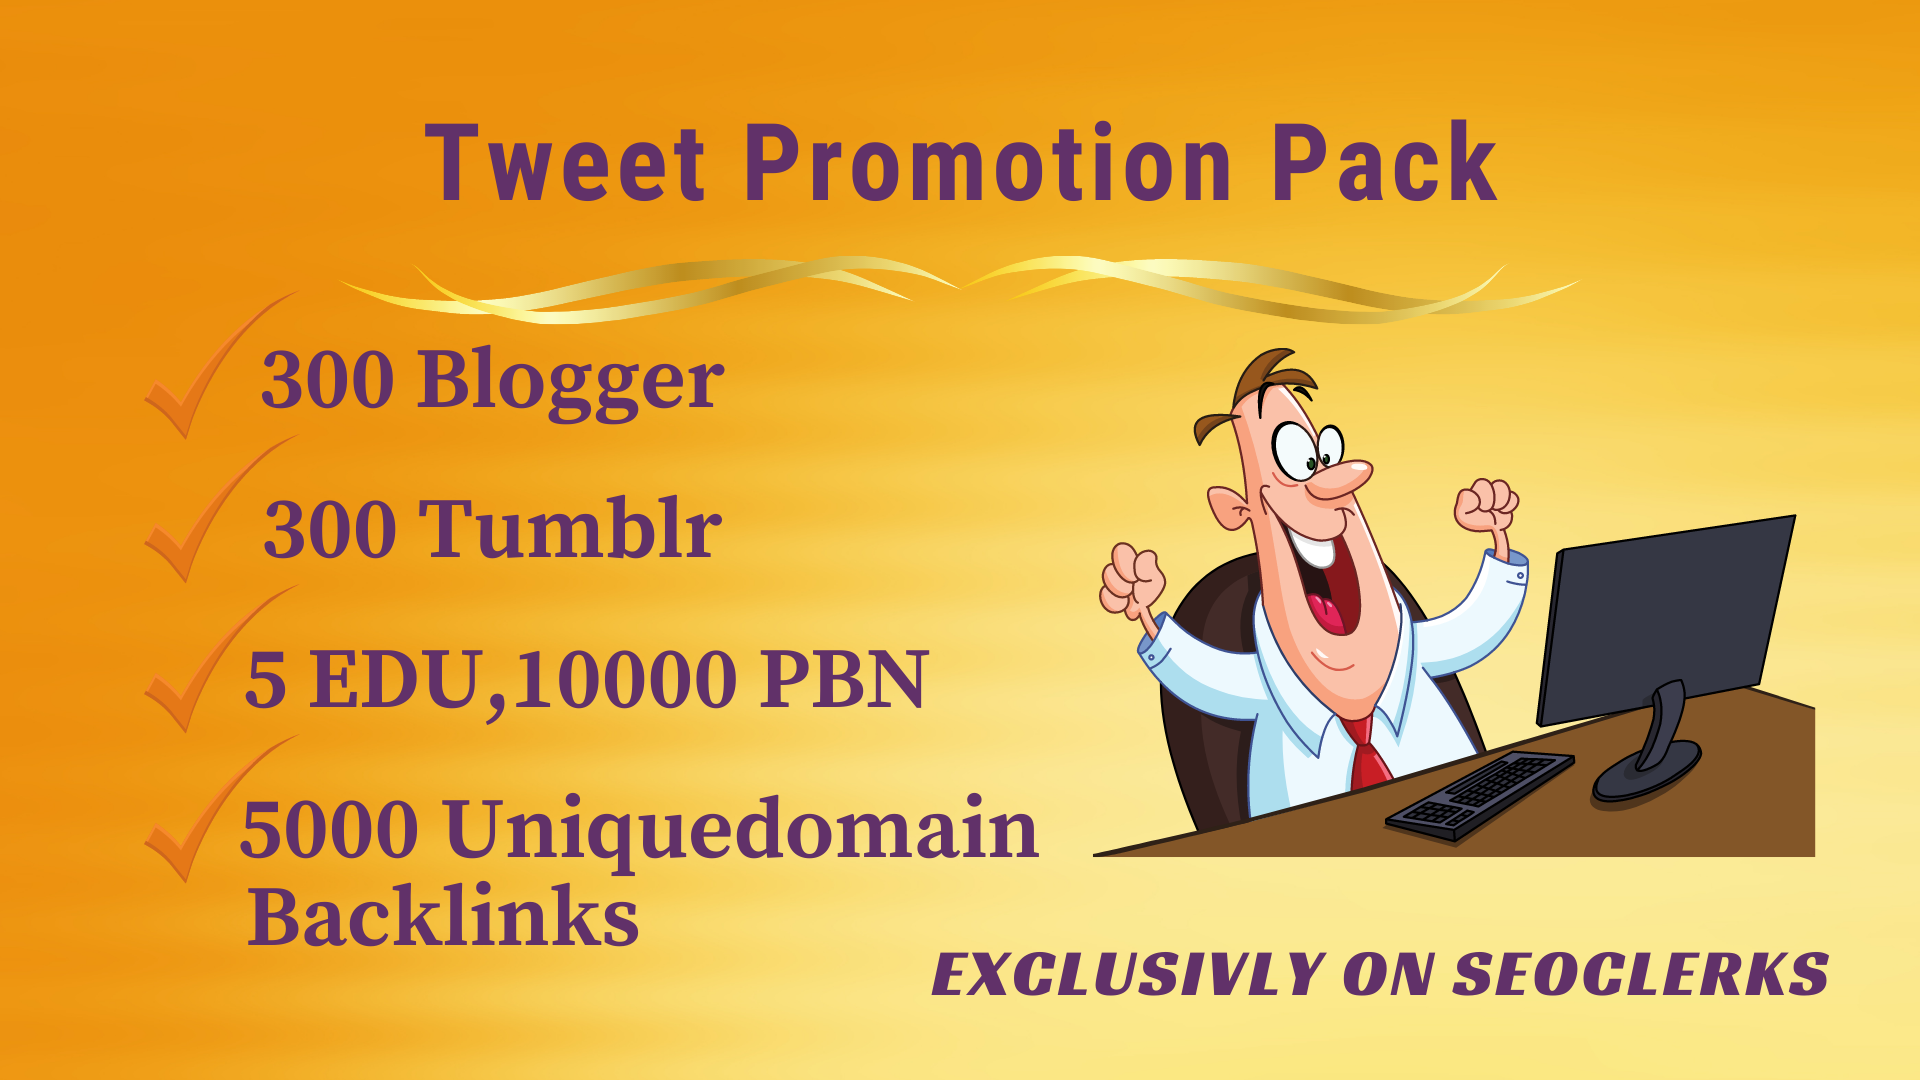 Twitter Tweet promo pack -Get 5 EDU,  300 blogger,  tumblr,  10000 PBN,  5000 uniquedomain backlinks